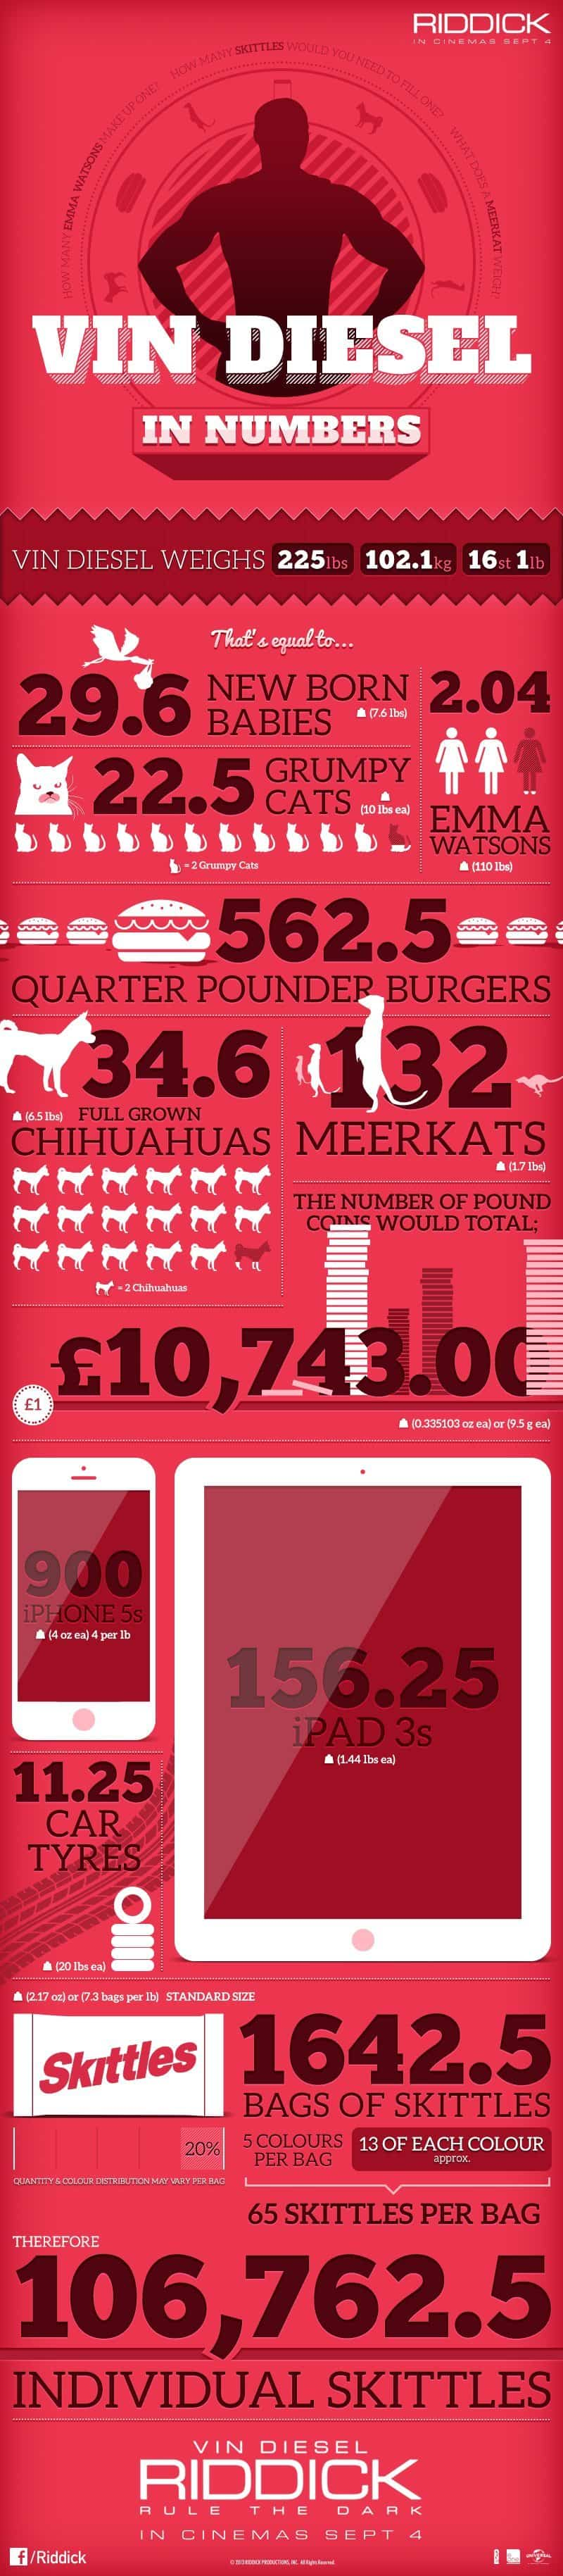 VinDiesel_infographic_FINAL